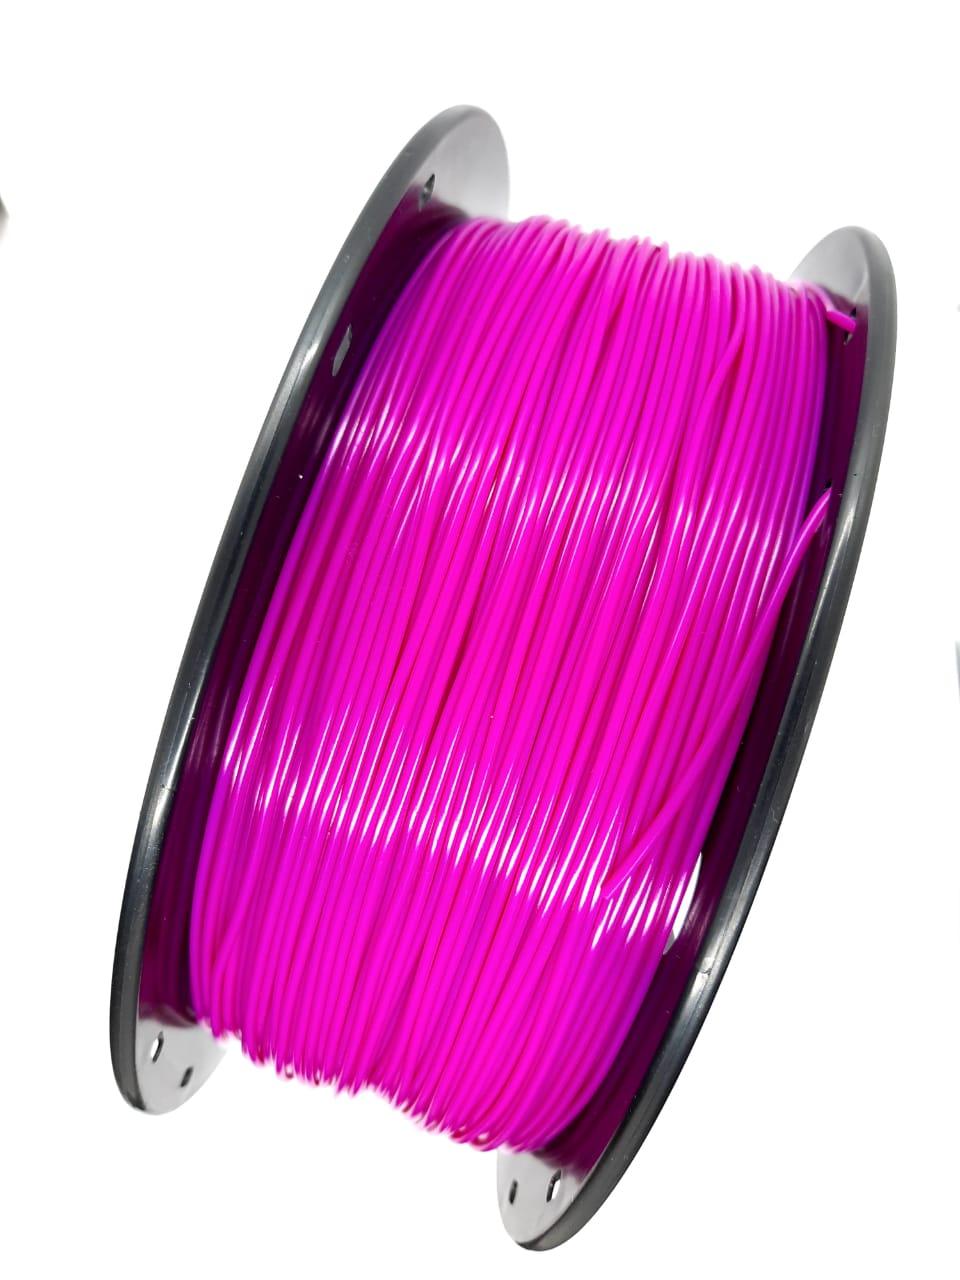 Filamento PLA - INGEO - Fúcsia - R3D - 1.75mm - 1kg